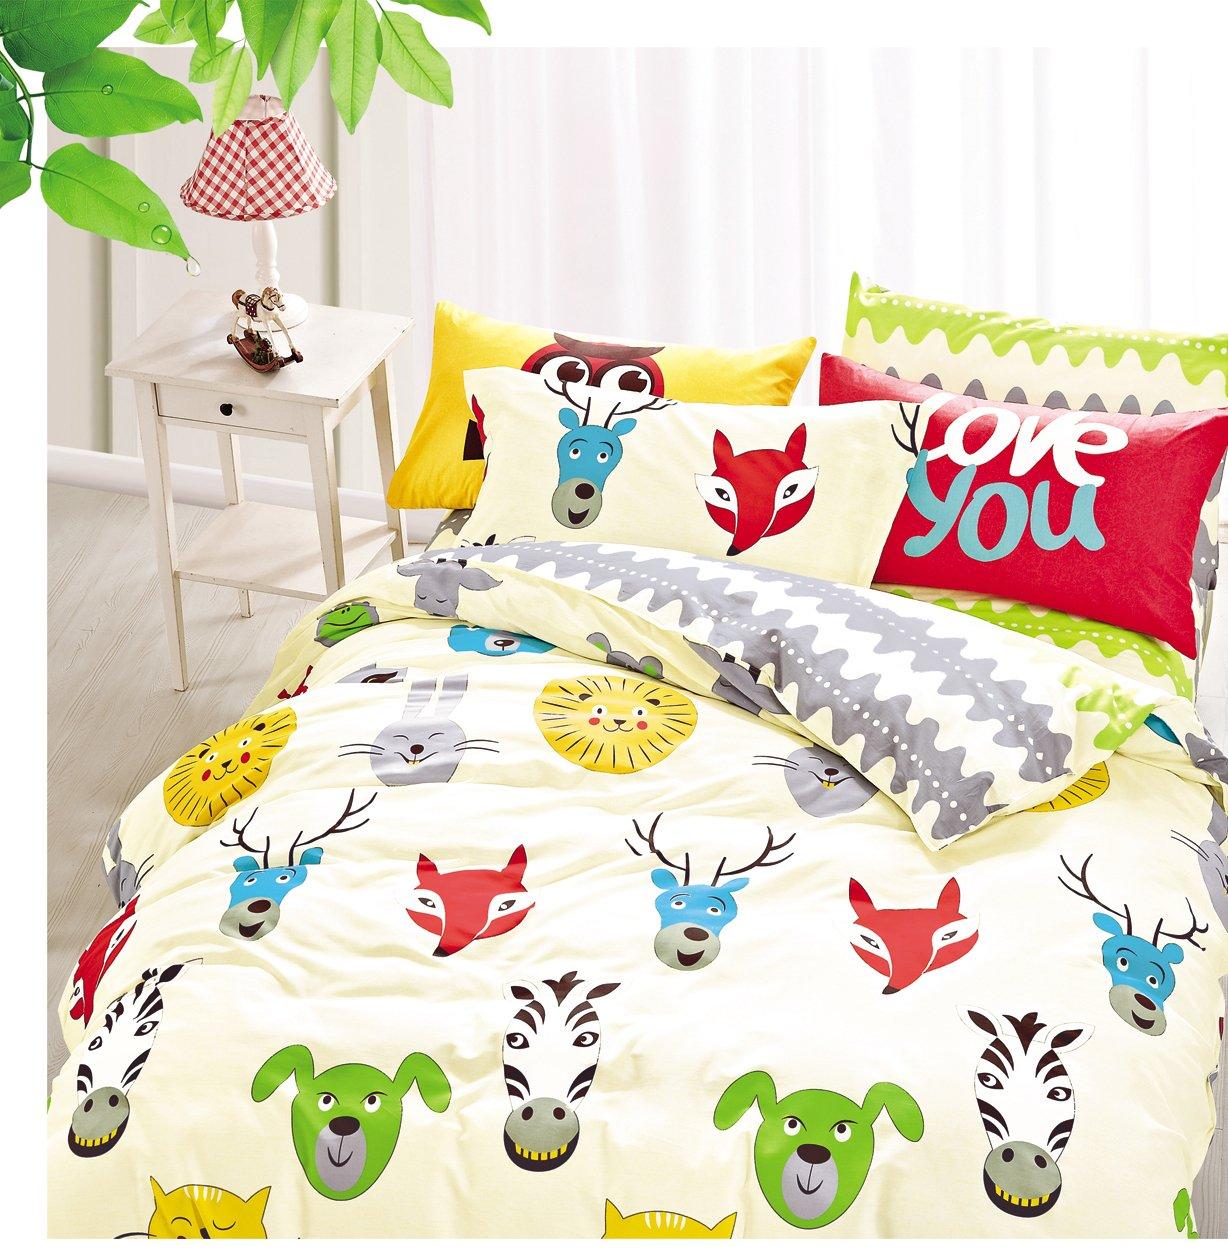 Cliab Animal Print Bedding King Size Lion Fox Zebra Dog Rabbit Cat Duvet Cover Set